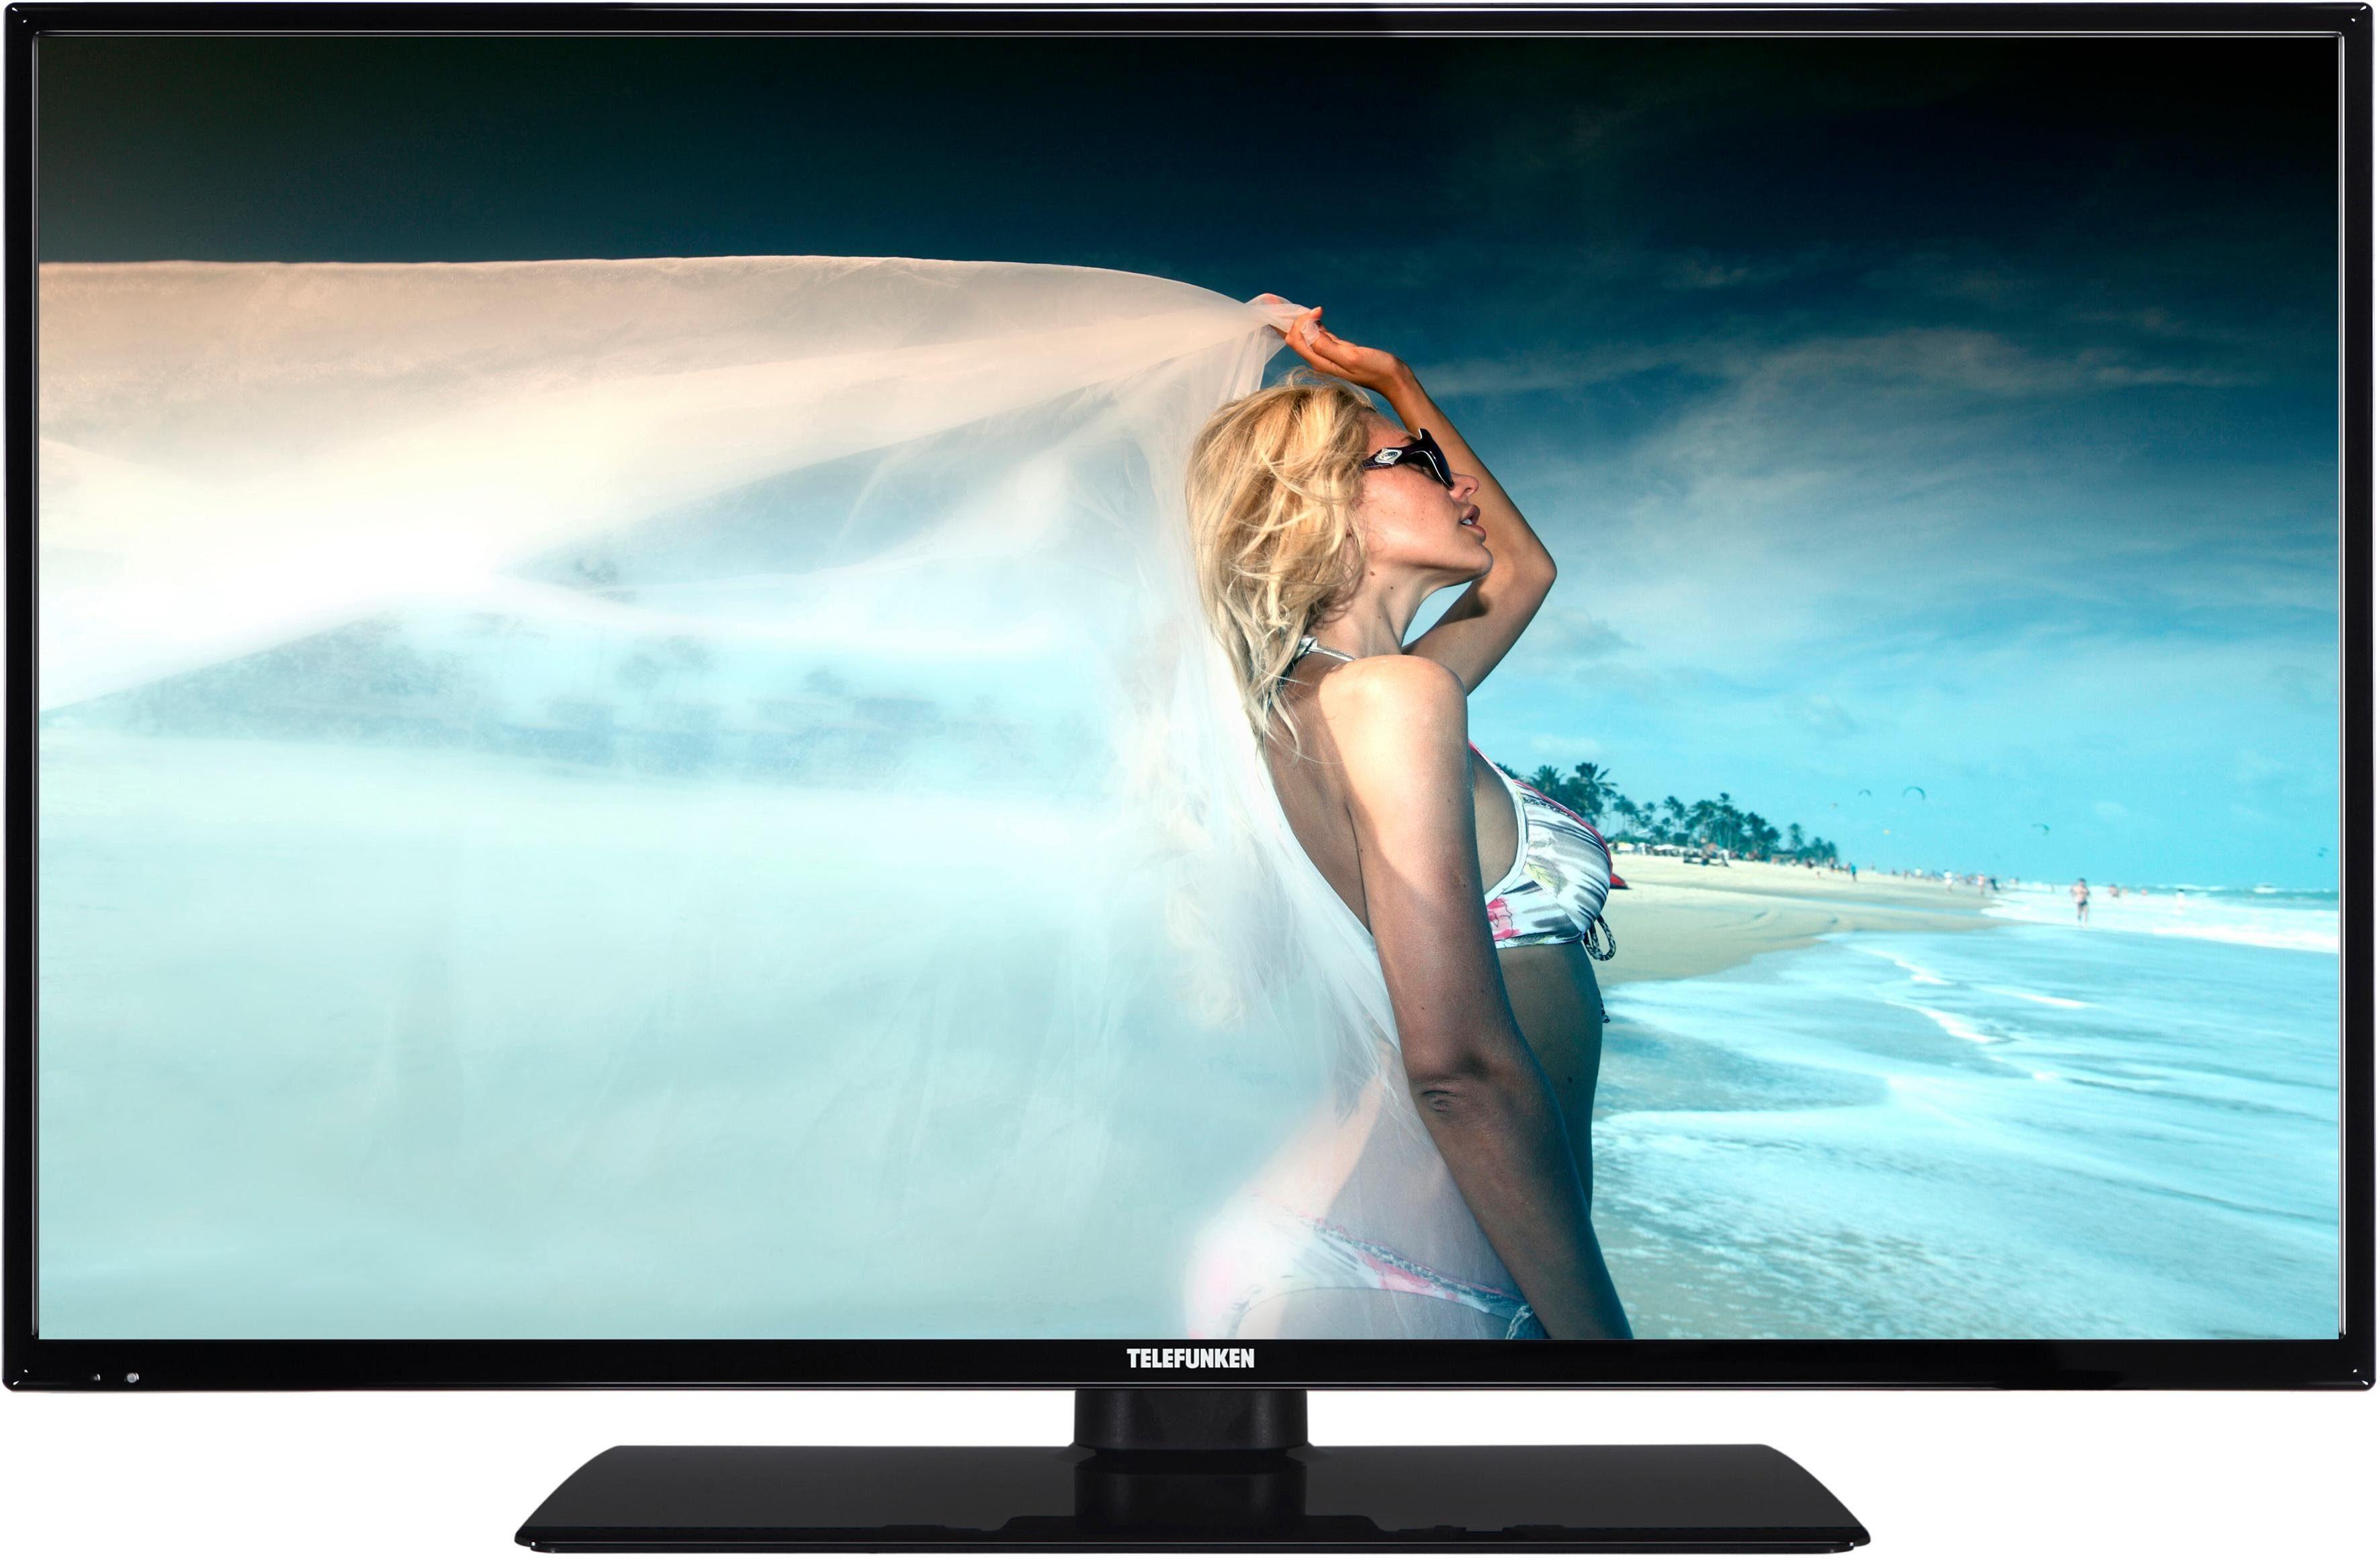 Telefunken D32H287M4CWI LED-Fernseher (81 cm/32 Zoll, HD-ready)